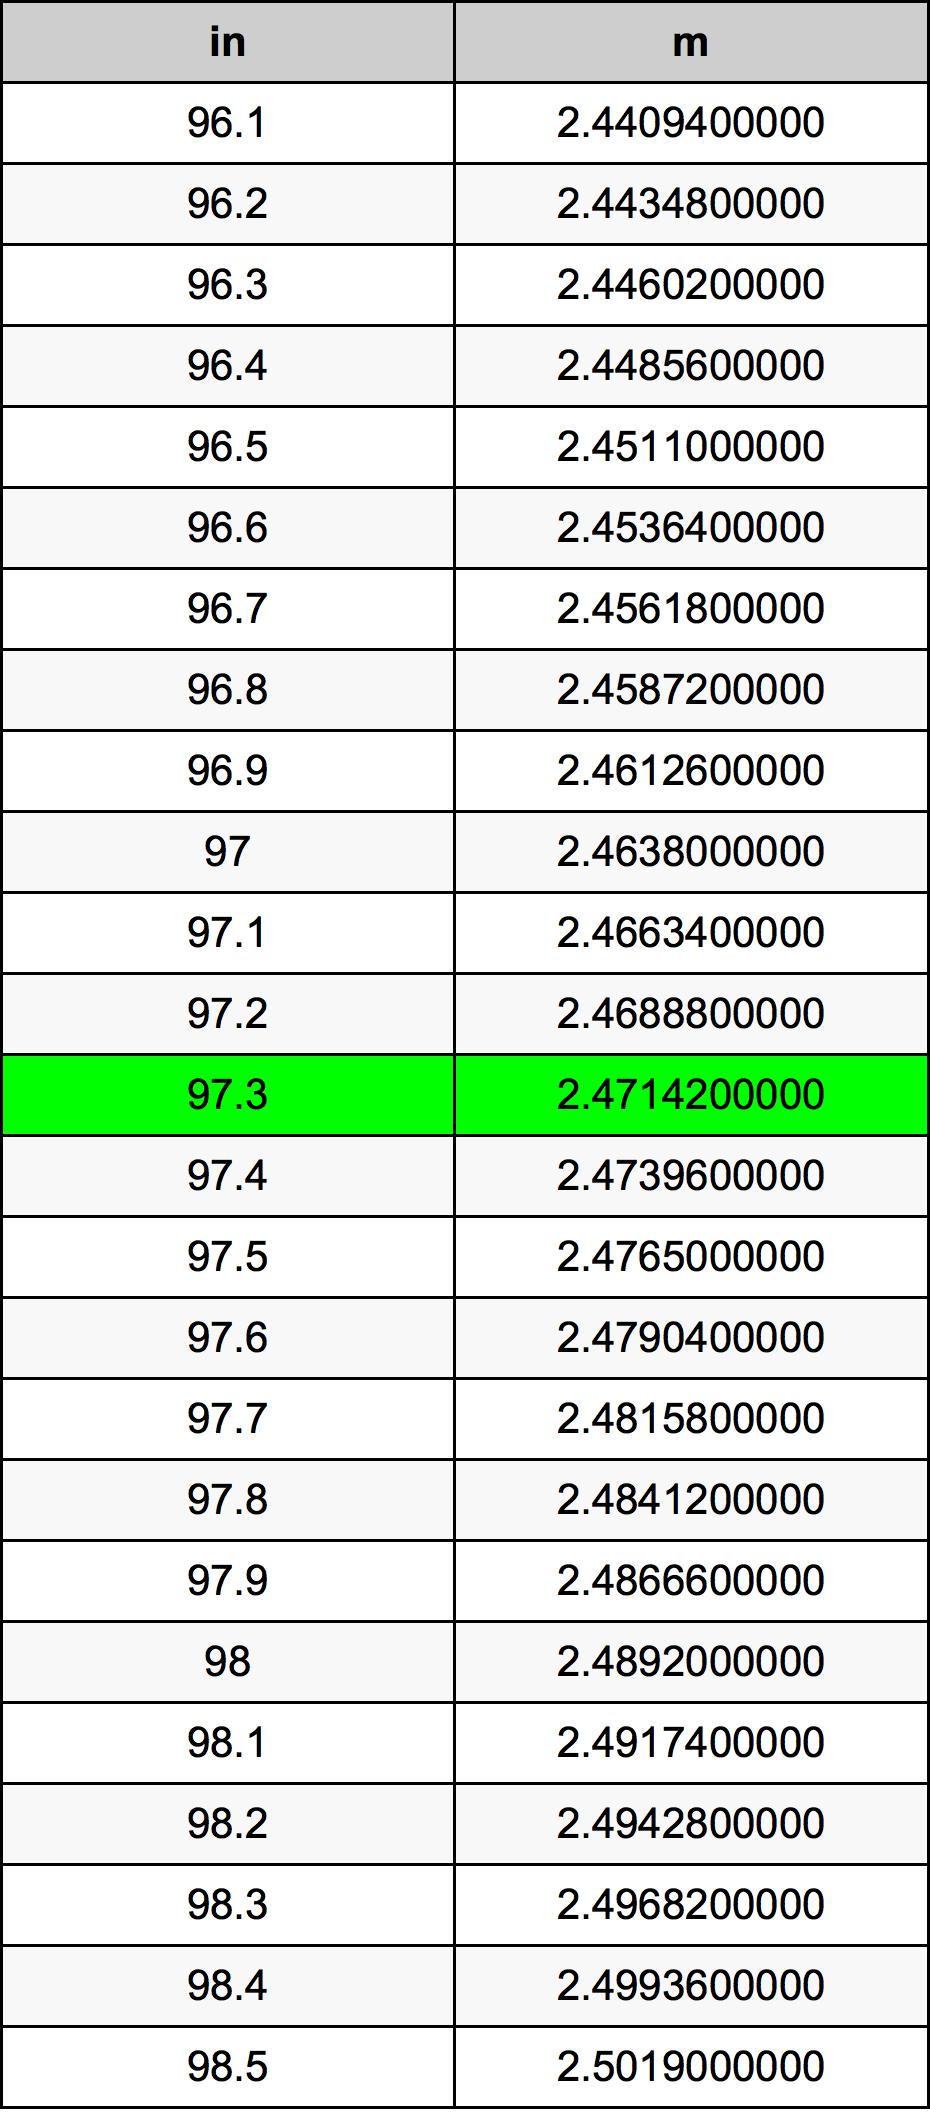 97.3 Inch konverteringstabell